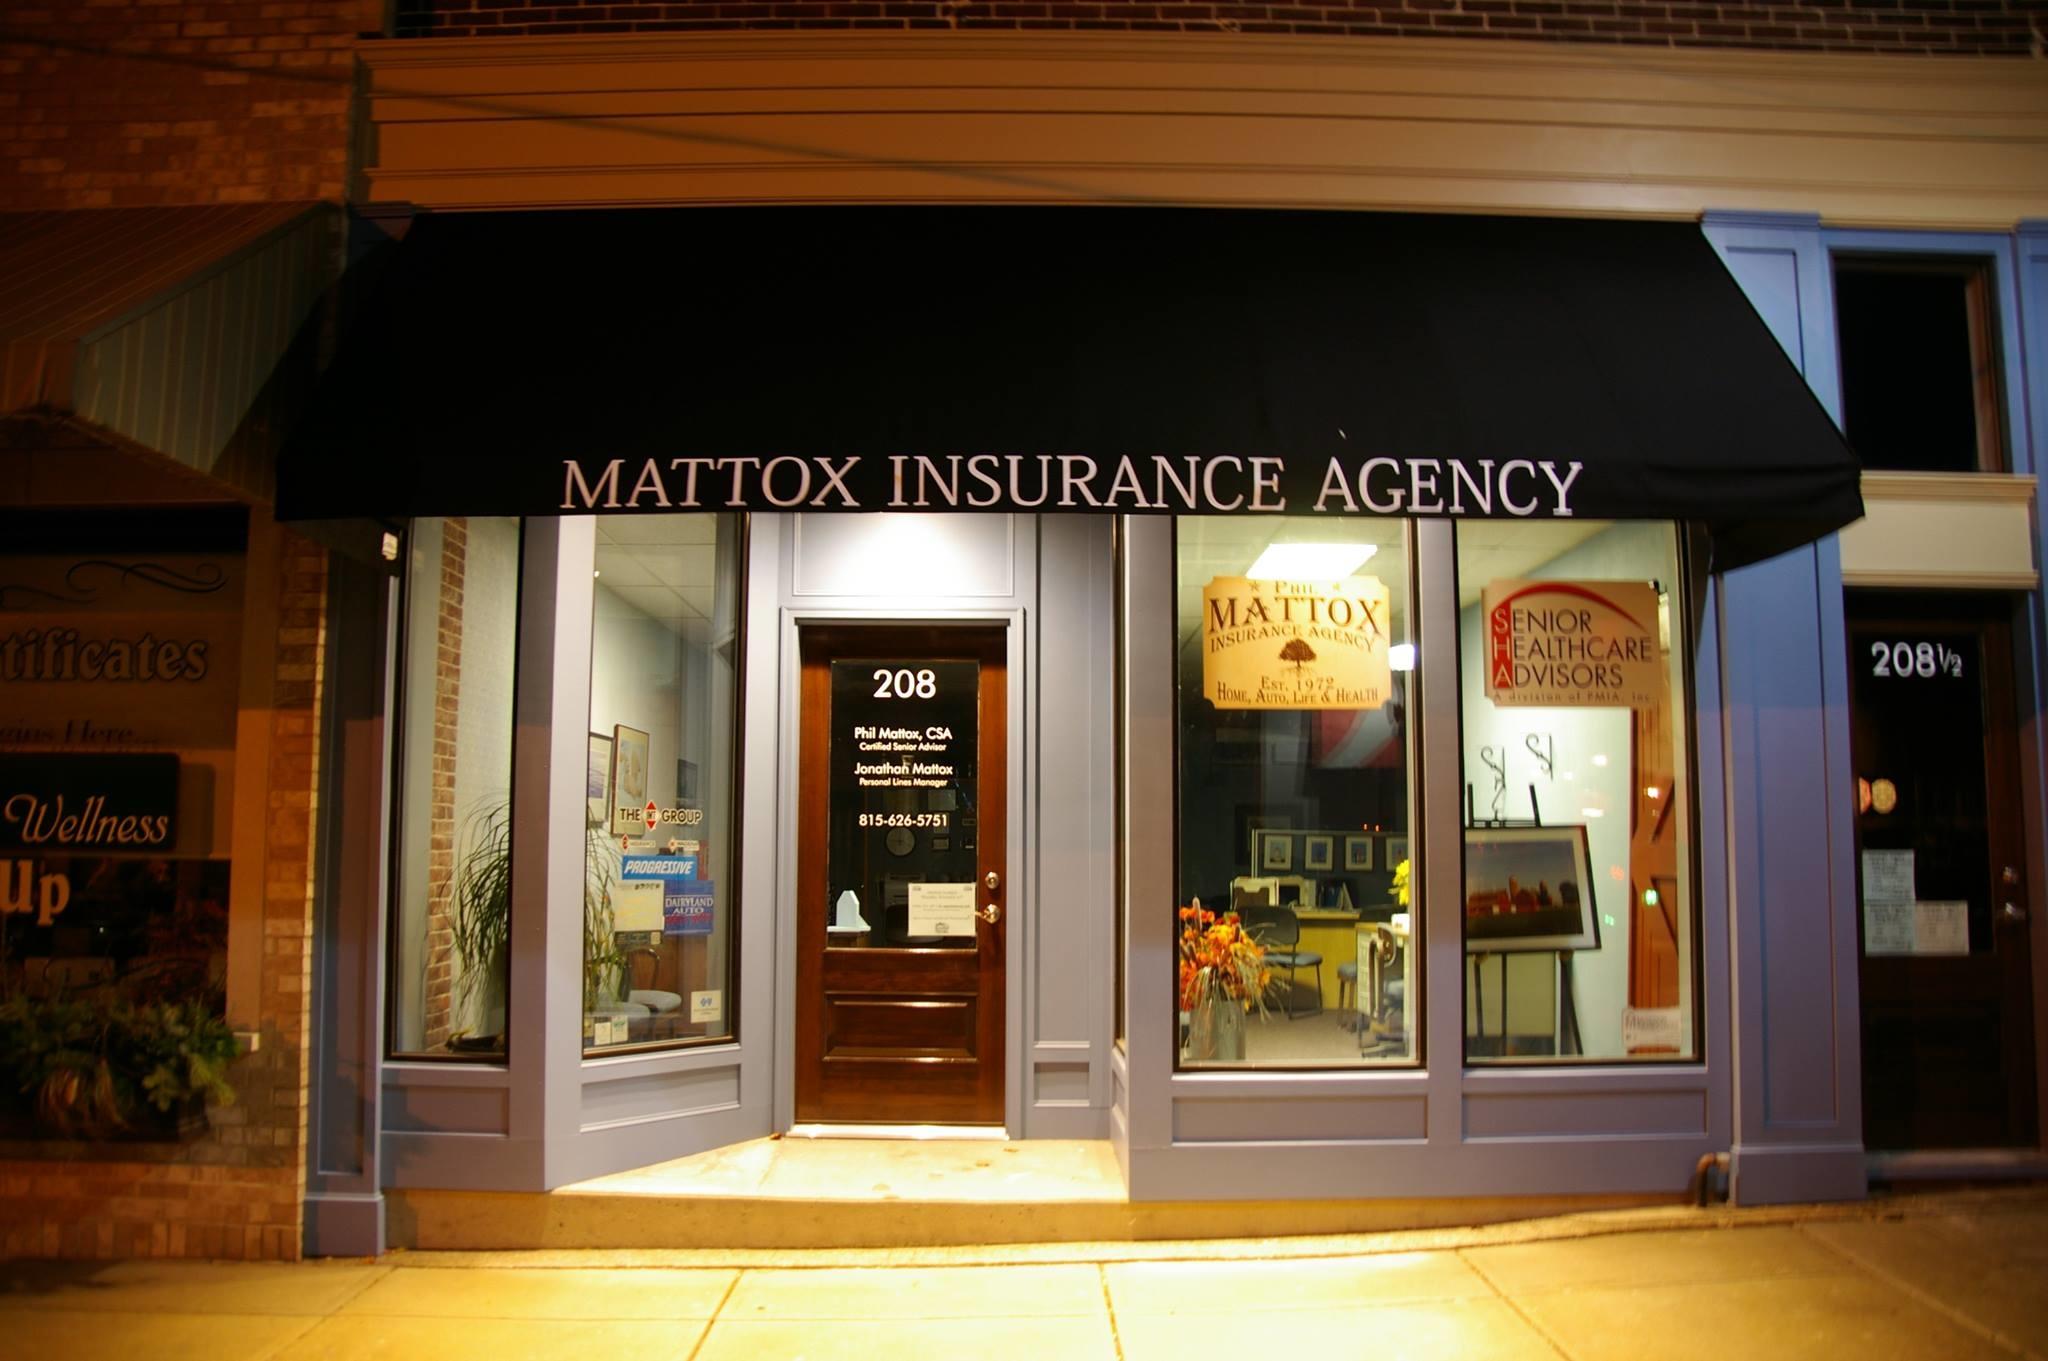 Phil Mattox Insurance Agency image 2